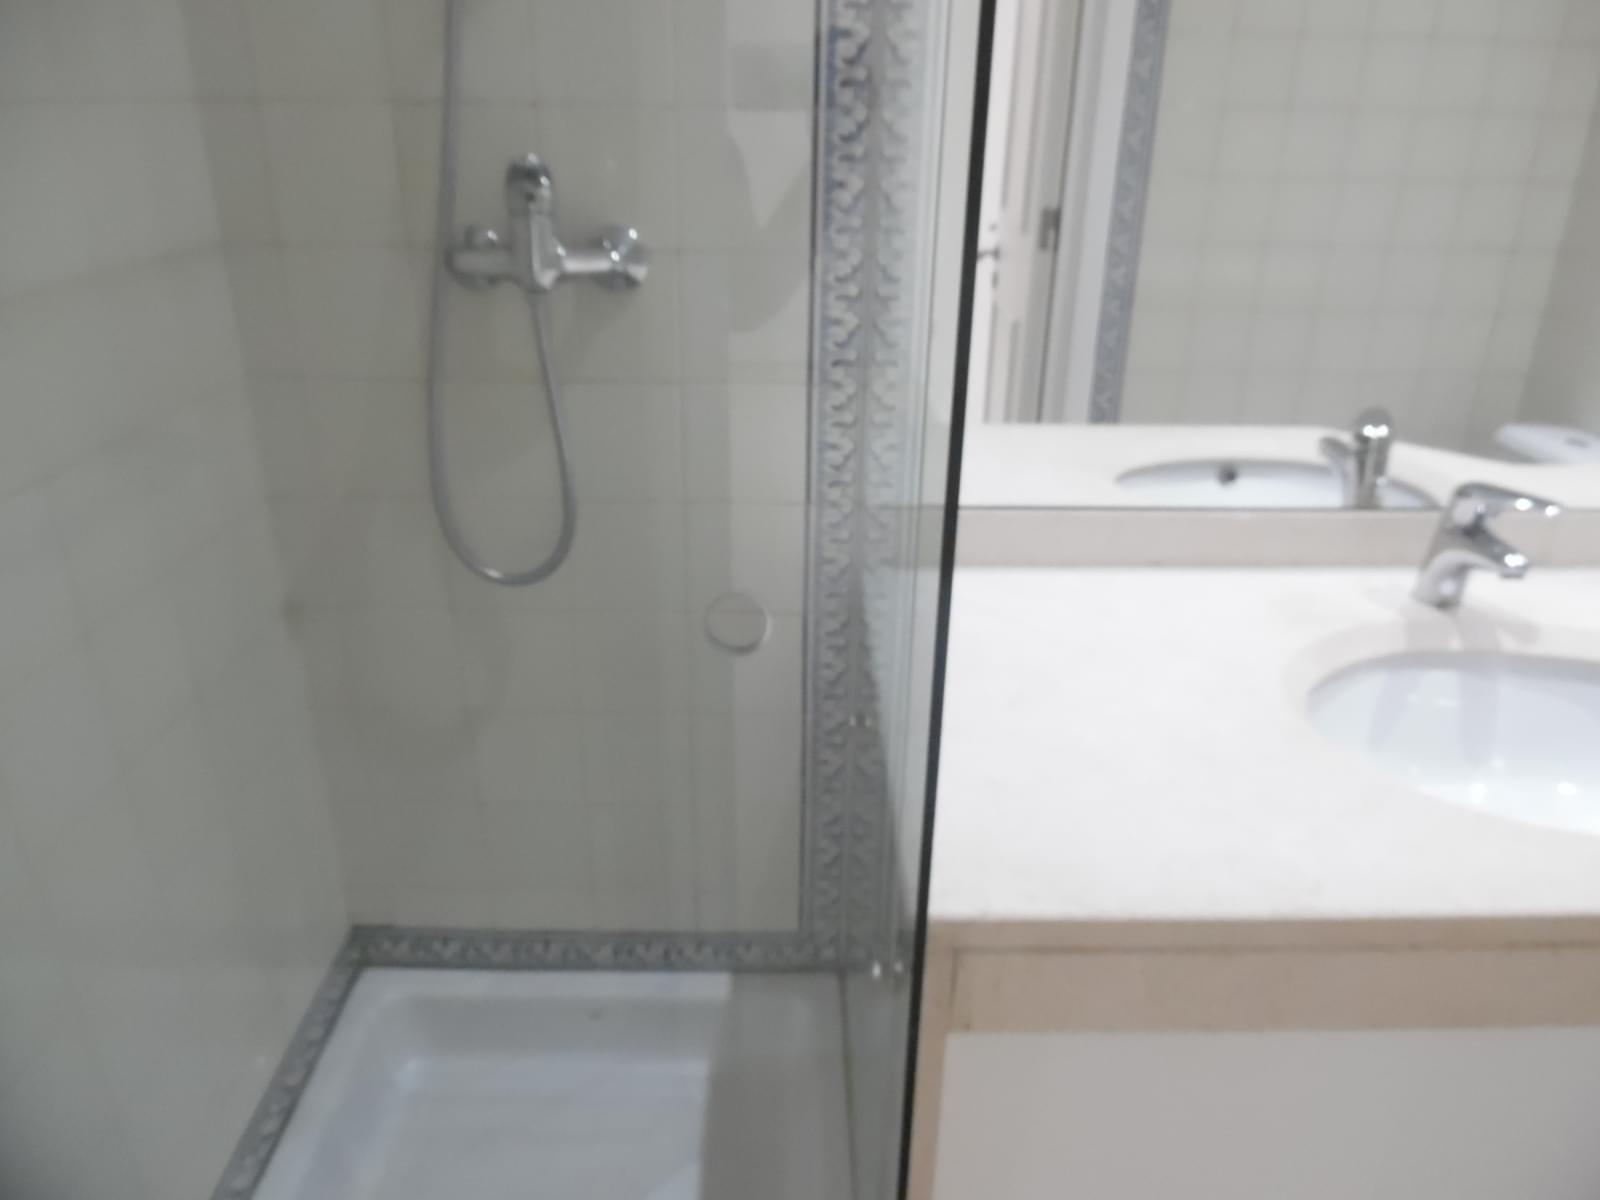 pf17637-apartamento-t2-lisboa-25a41adb-dffa-42b3-a587-5fd6bf94149d